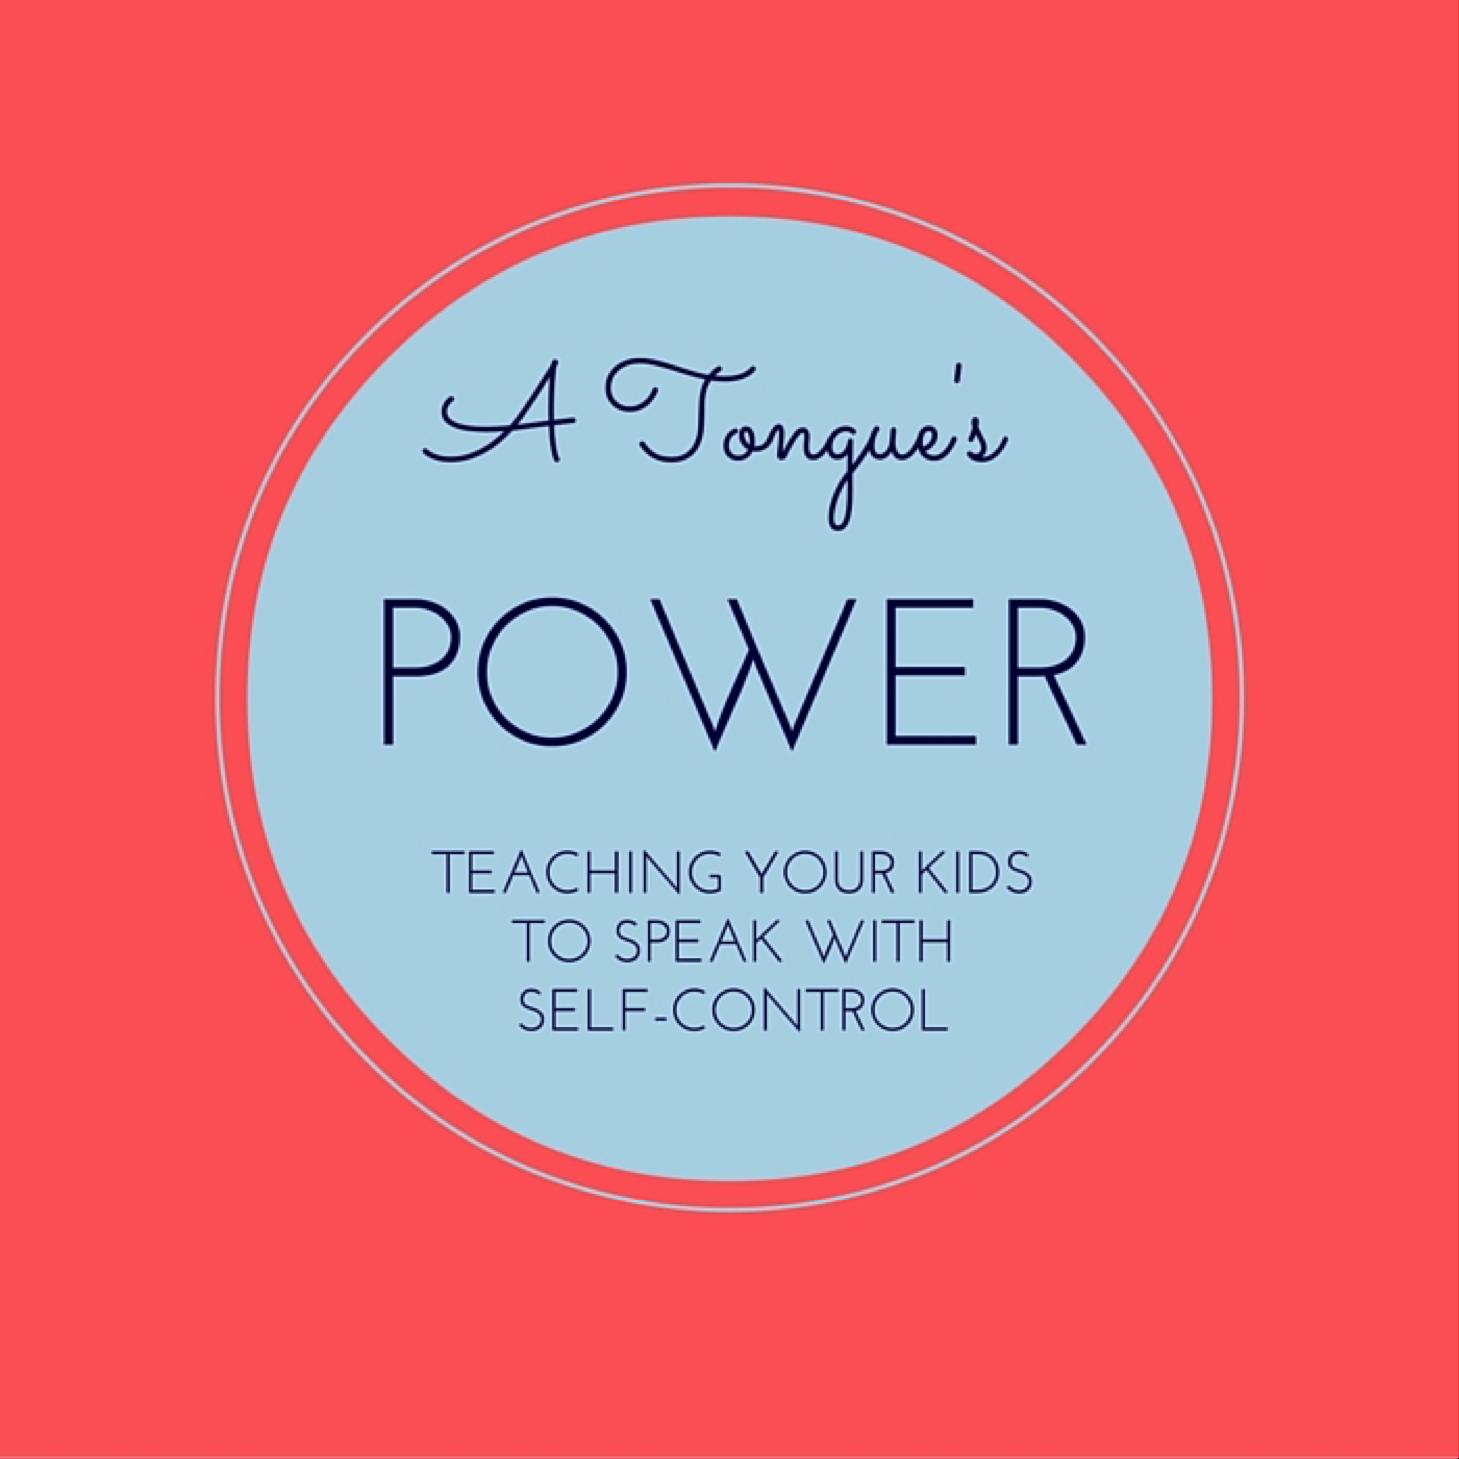 tongues_power_teaching_kids_to_speak.png